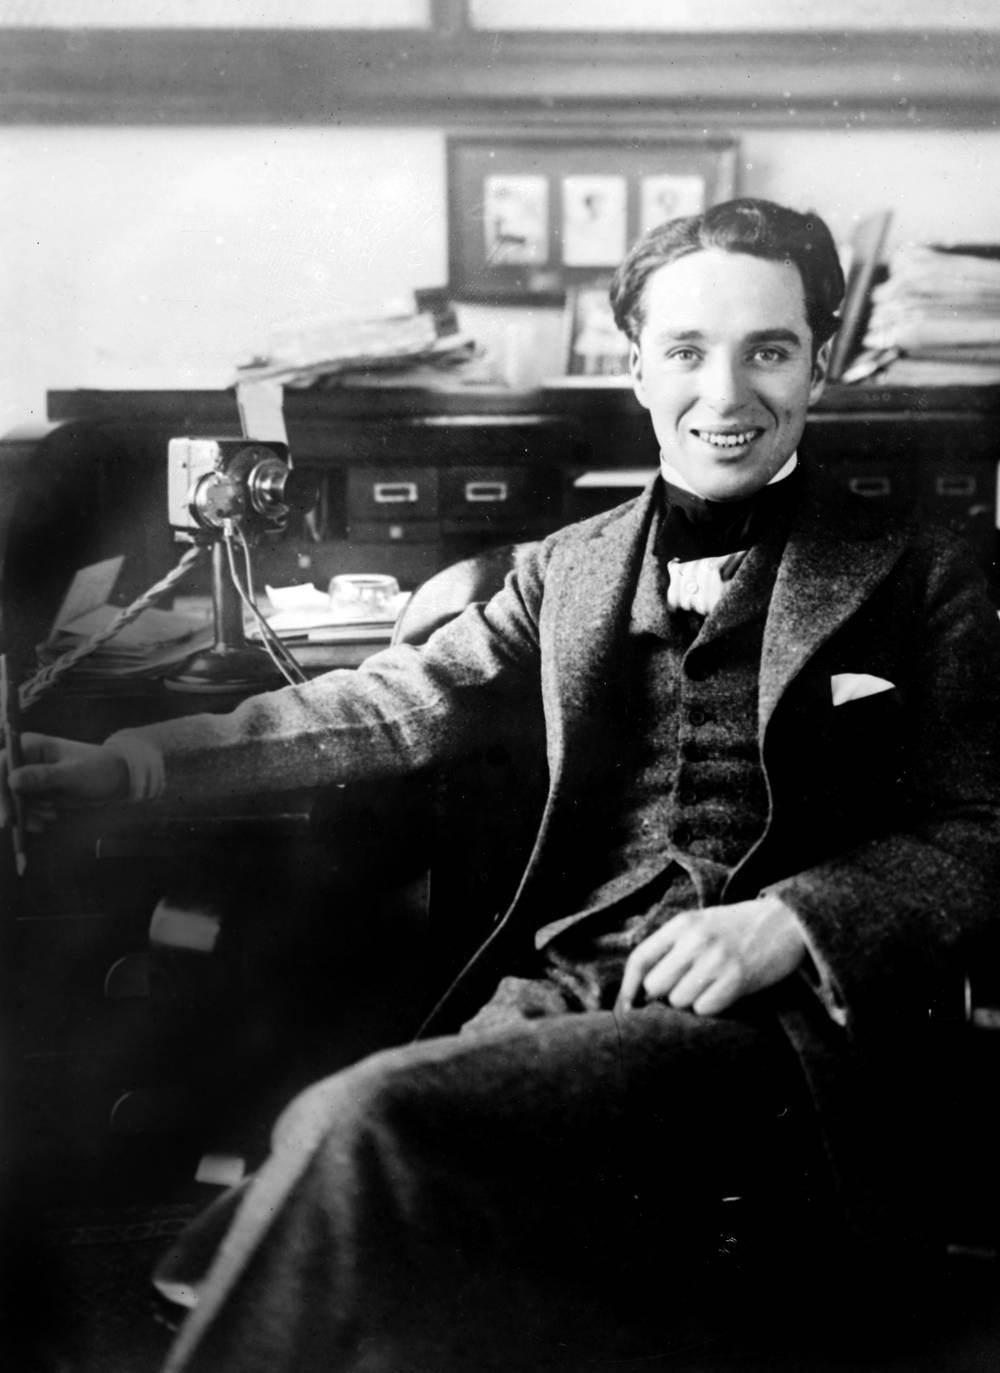 Charlie Chaplin - 1915 - Photographic print for sale